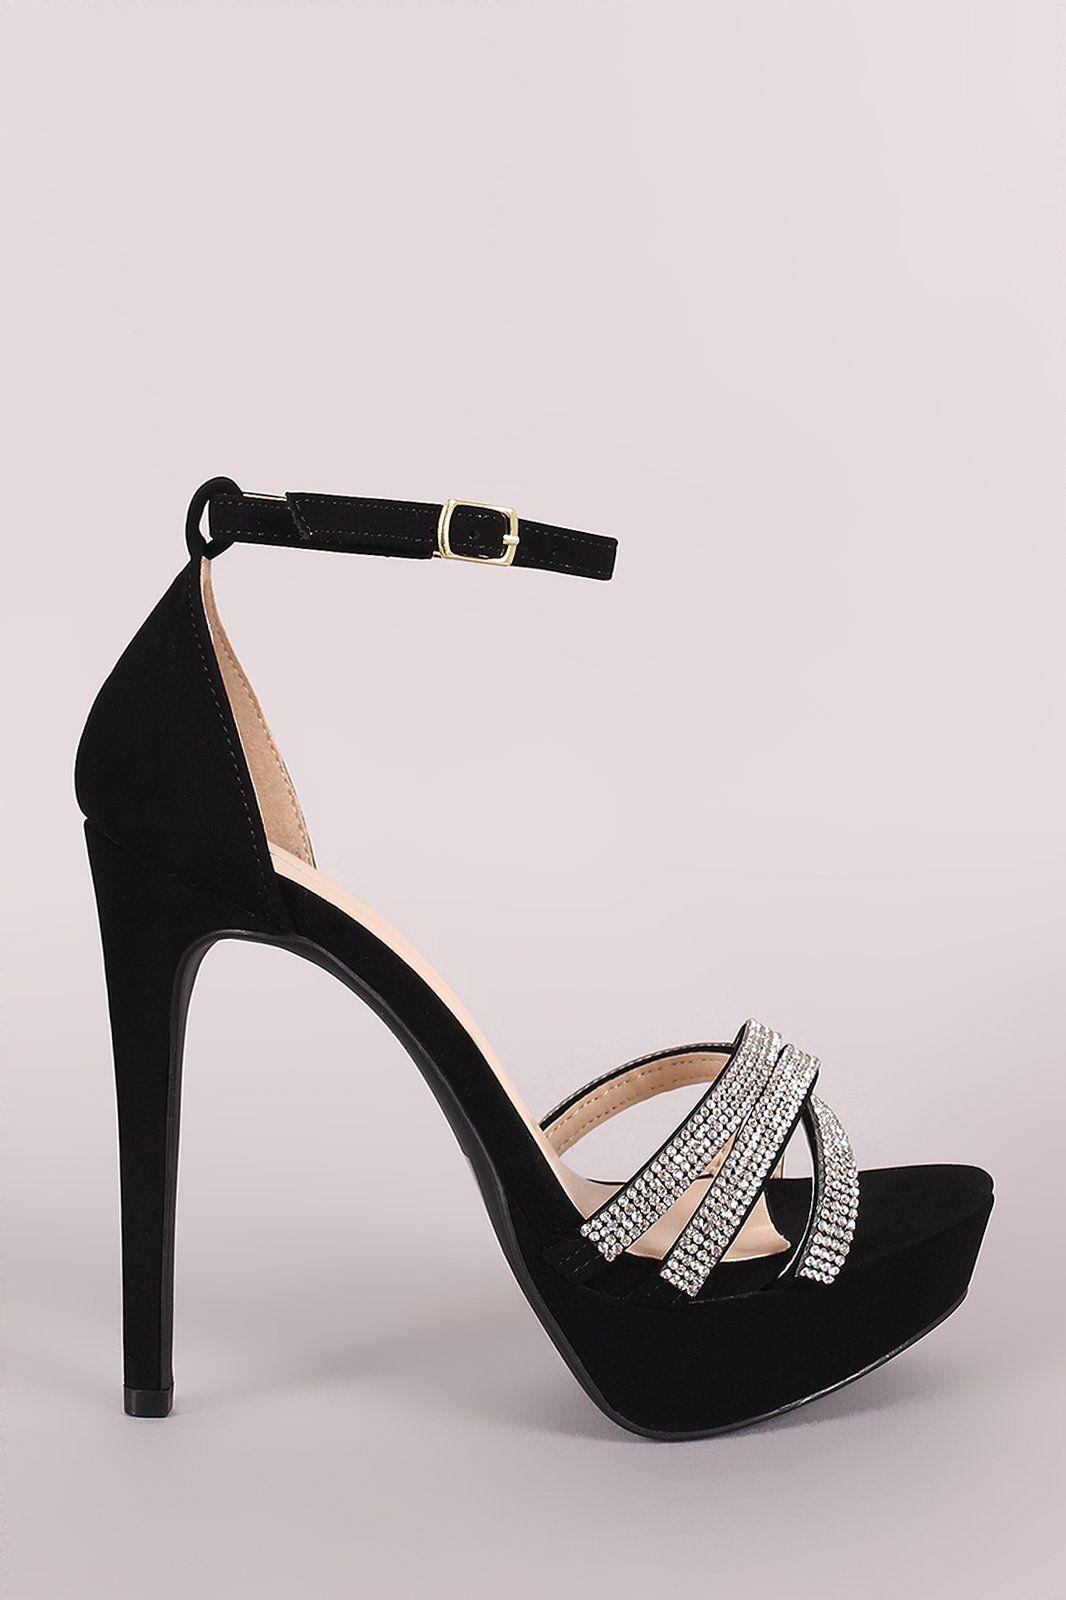 1dd790dc31c Qupid Nubuck Rhinestone Ankle Strap Stiletto Platform Heel | Shoes ...